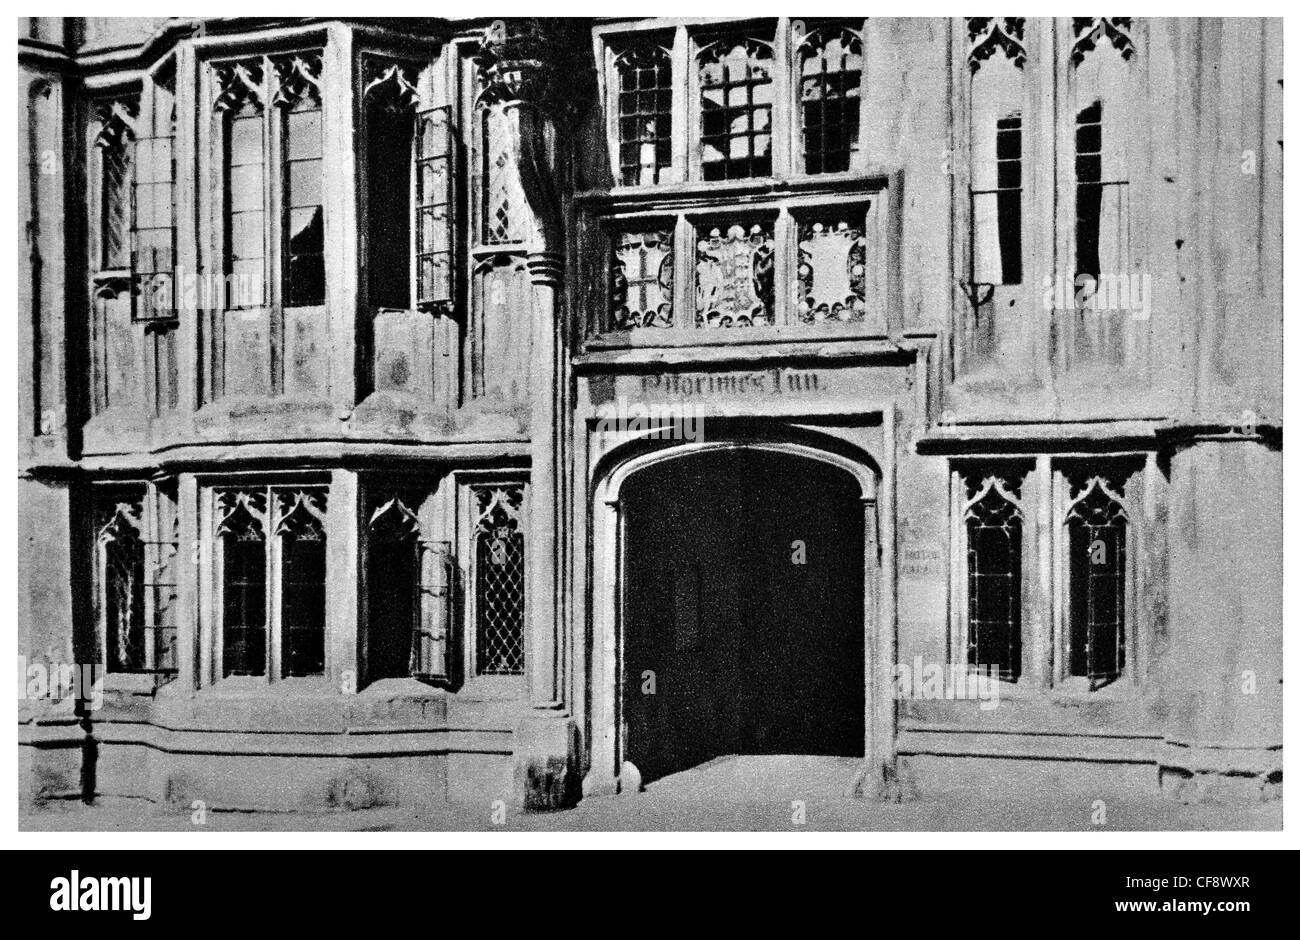 Glastonbury George Hotel and Pilgrims' Inn 15th century public house pub tavern Grade I listed building Somerset - Stock Image